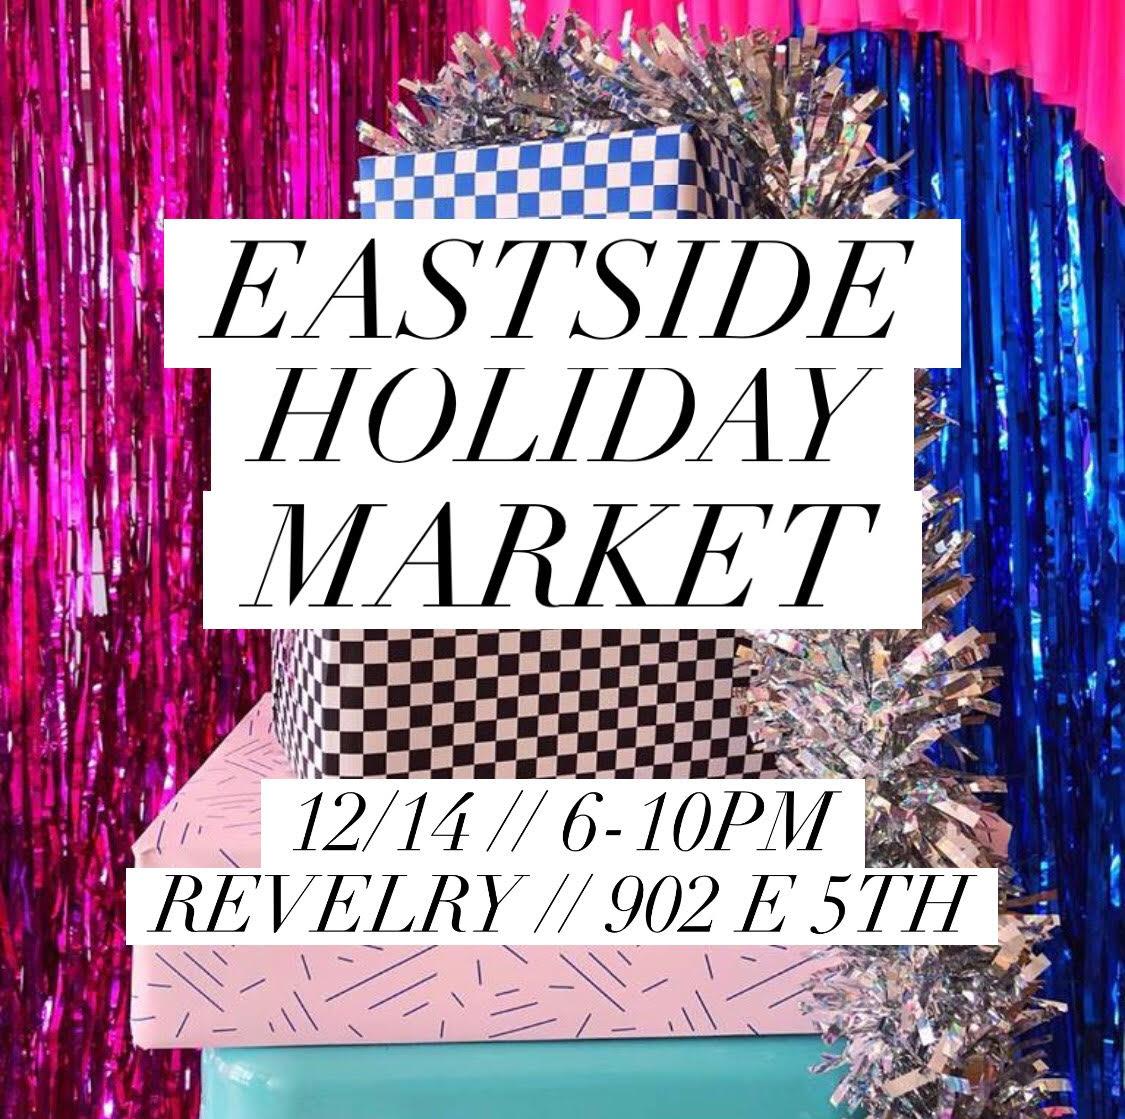 Eastside Holiday Market Flyer.jpg